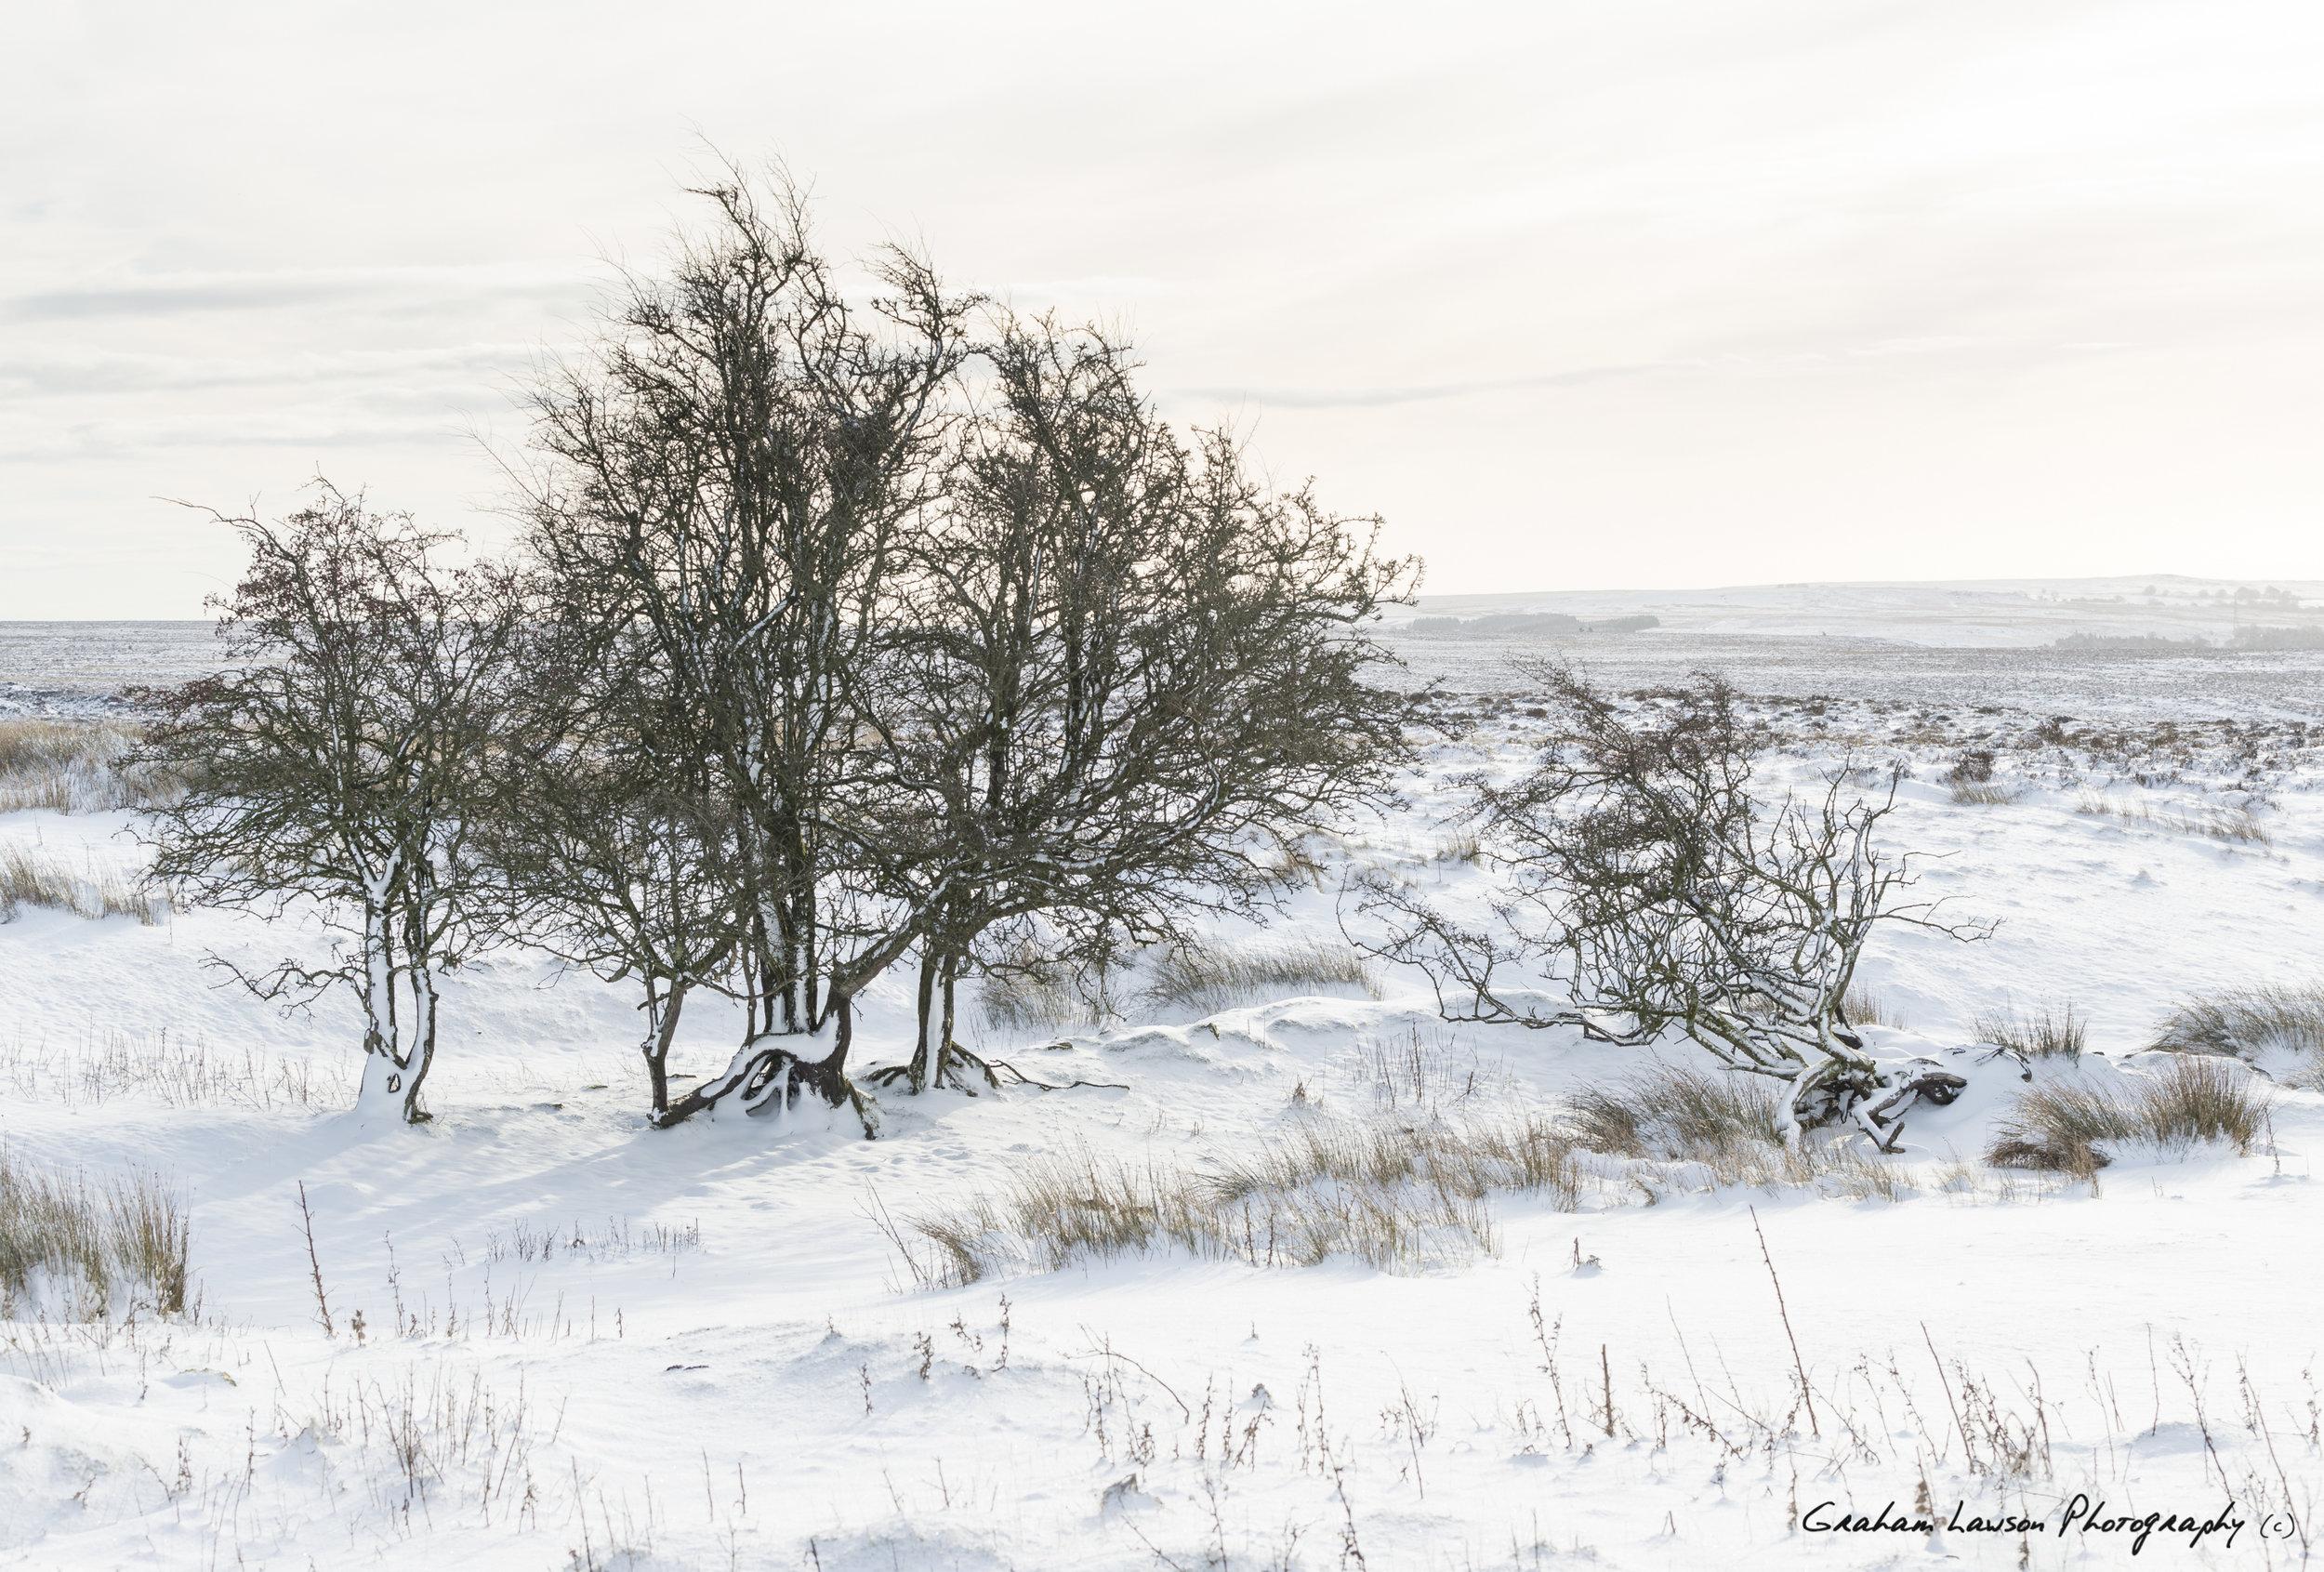 Llanover Snow